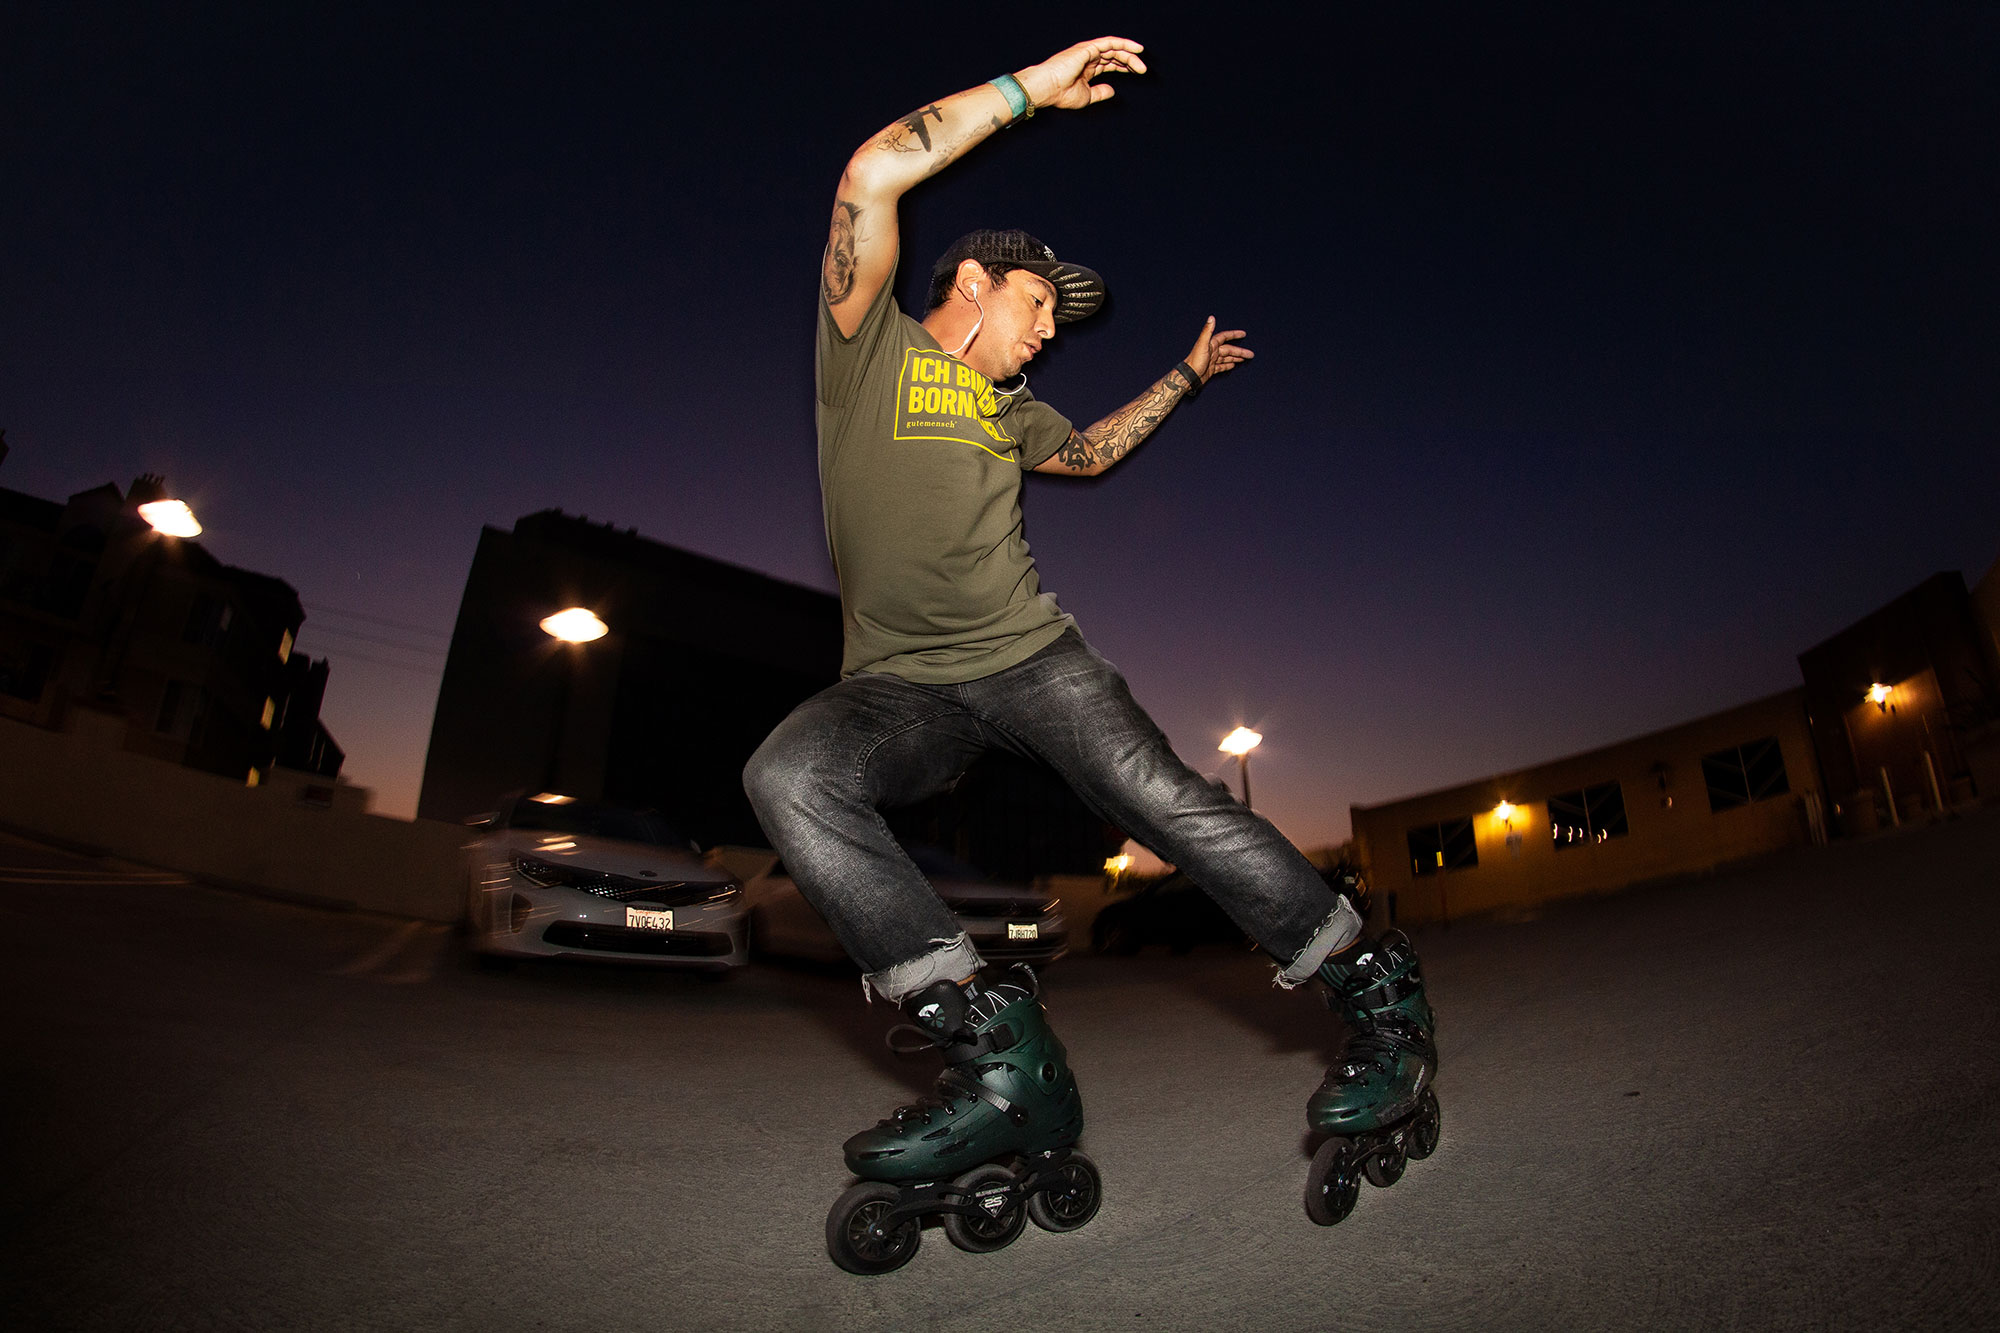 Juan Mosqueda Rolling Fakie. Photo by Jeff Linett.